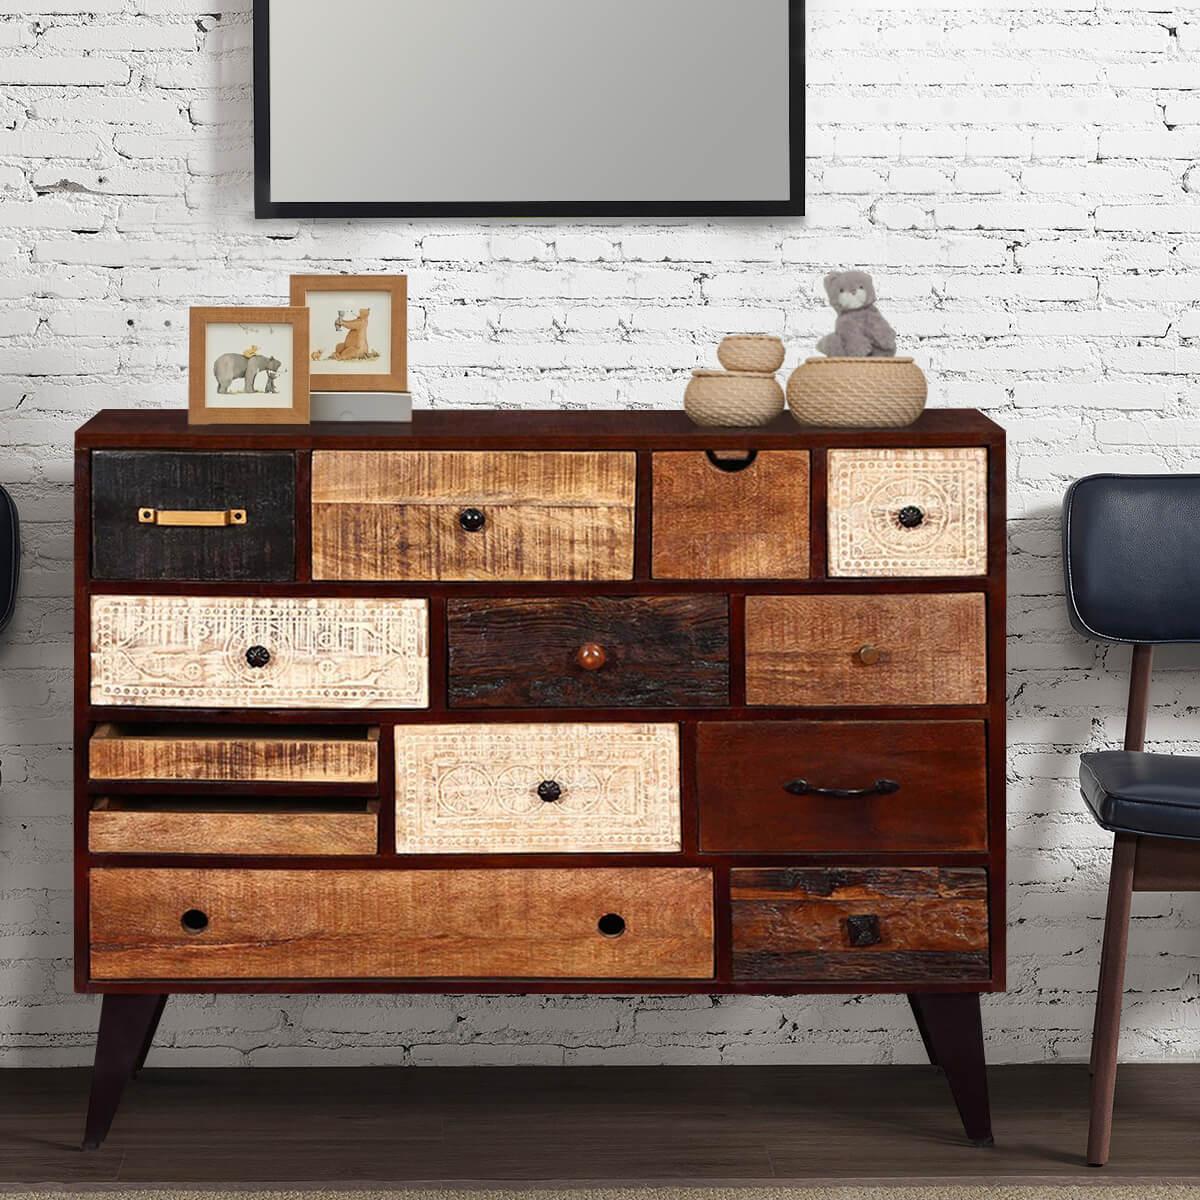 Appalachian Rustic Mango Wood 13 Drawer Accent Dresser Chest